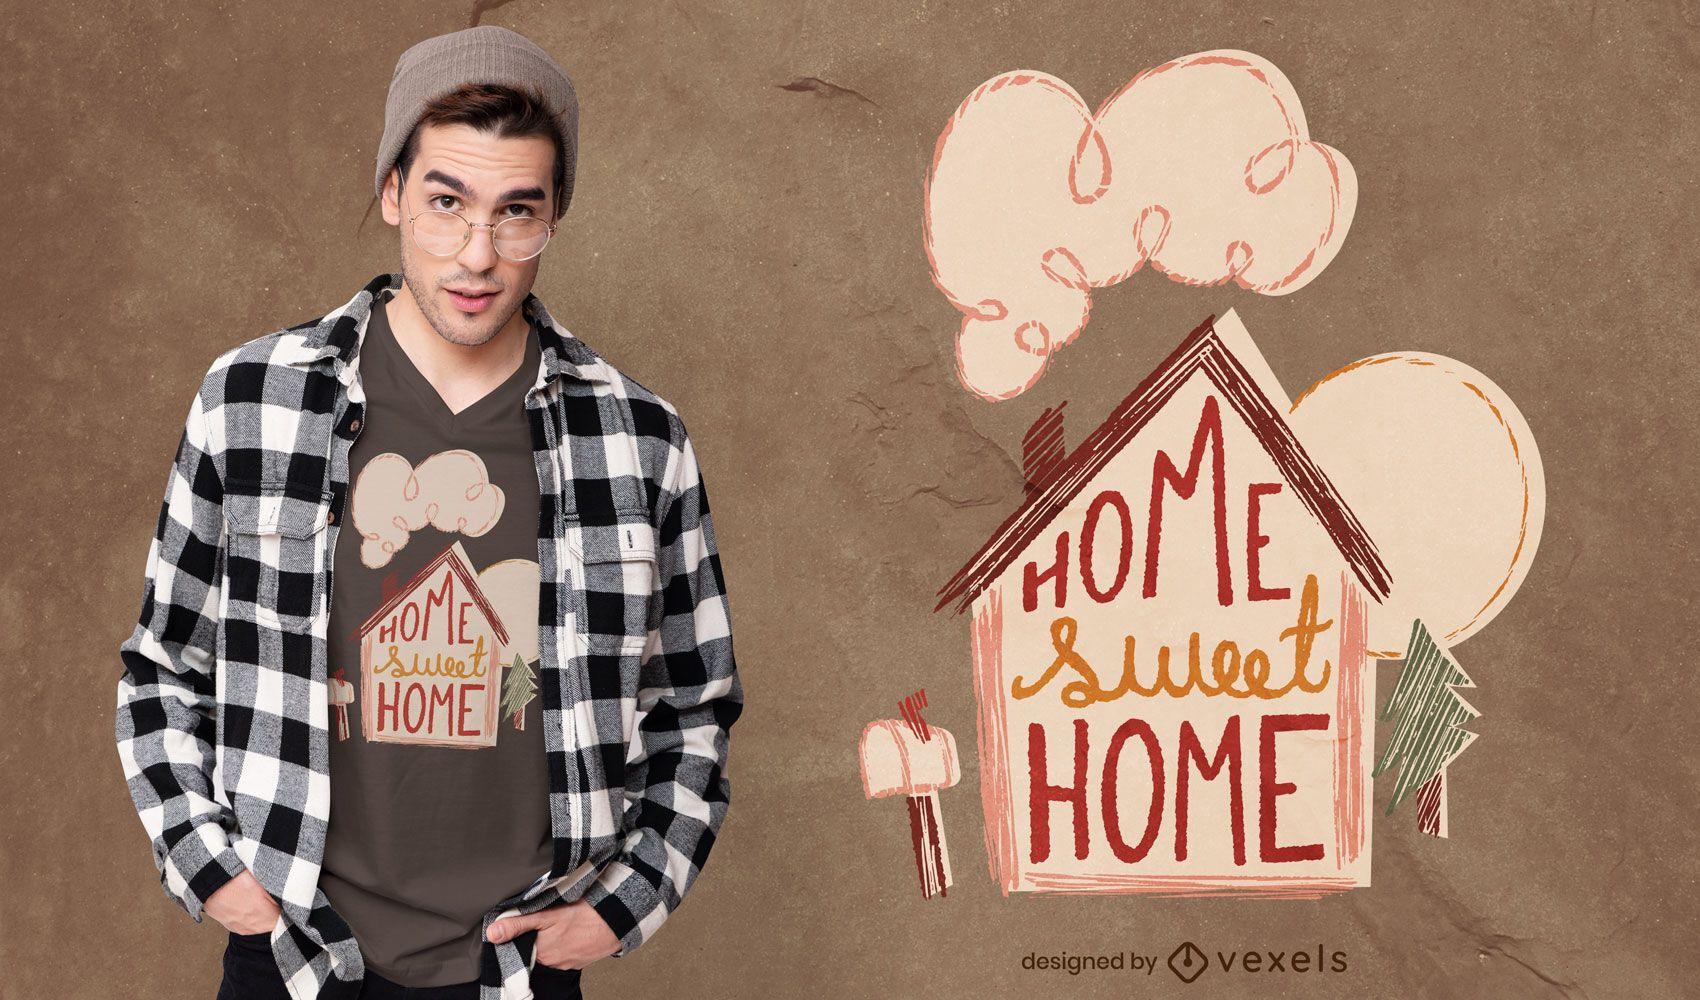 Home sweet home t-shirt design